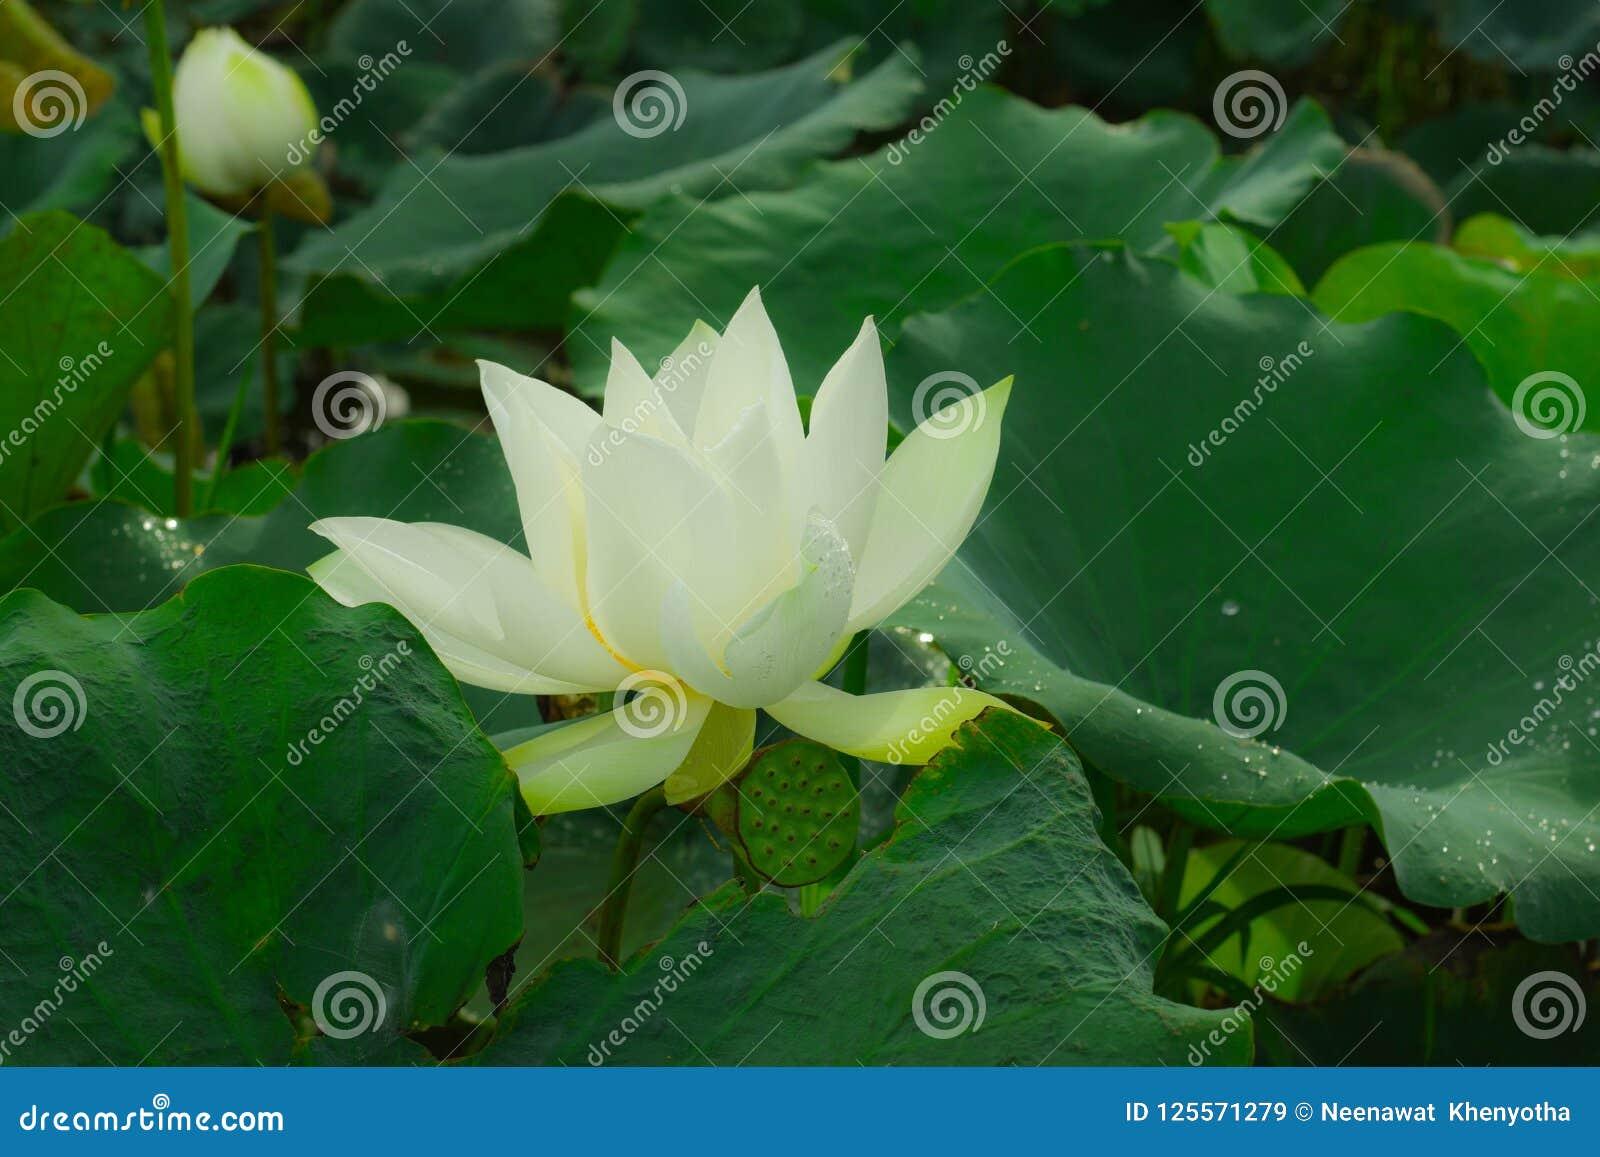 The Lotus Pool